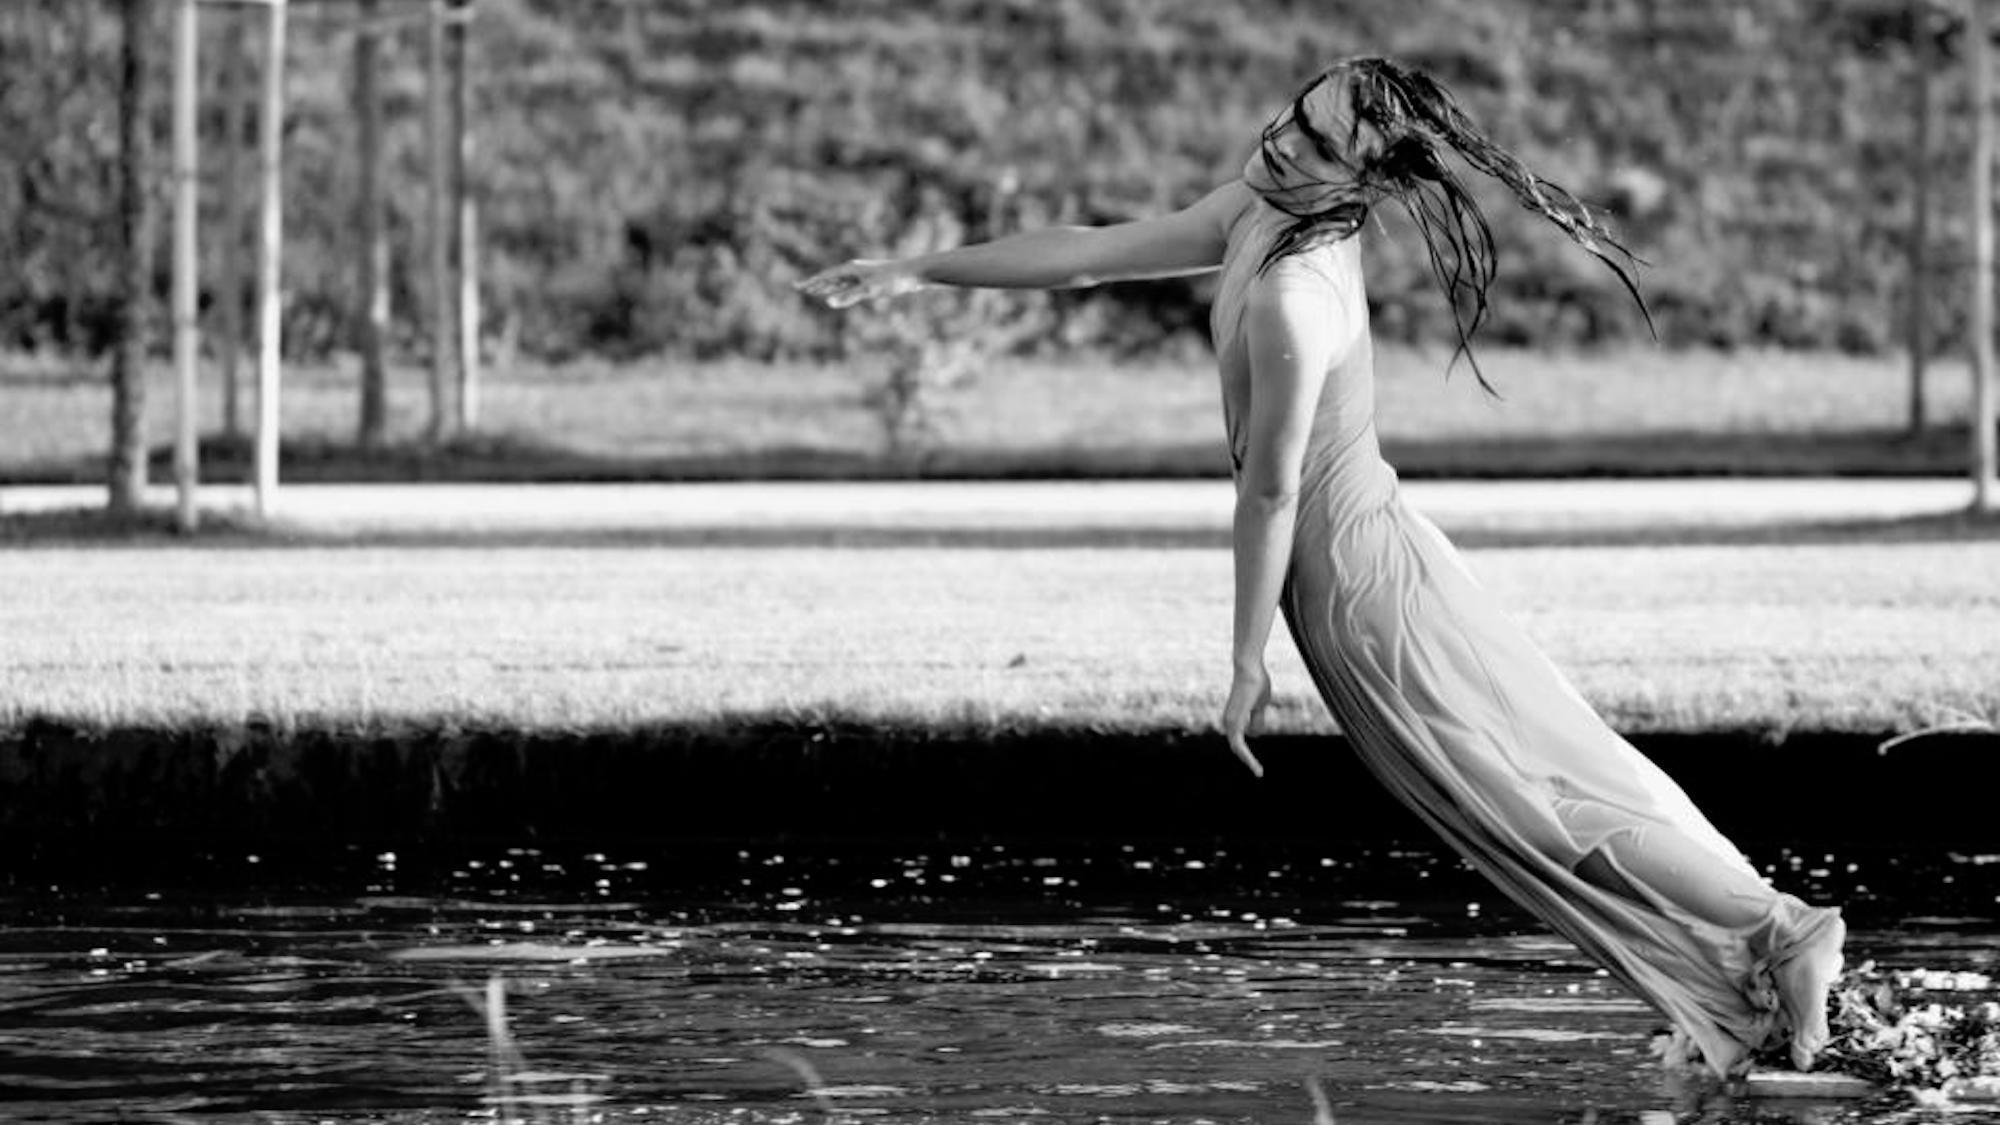 © Diego Fornero